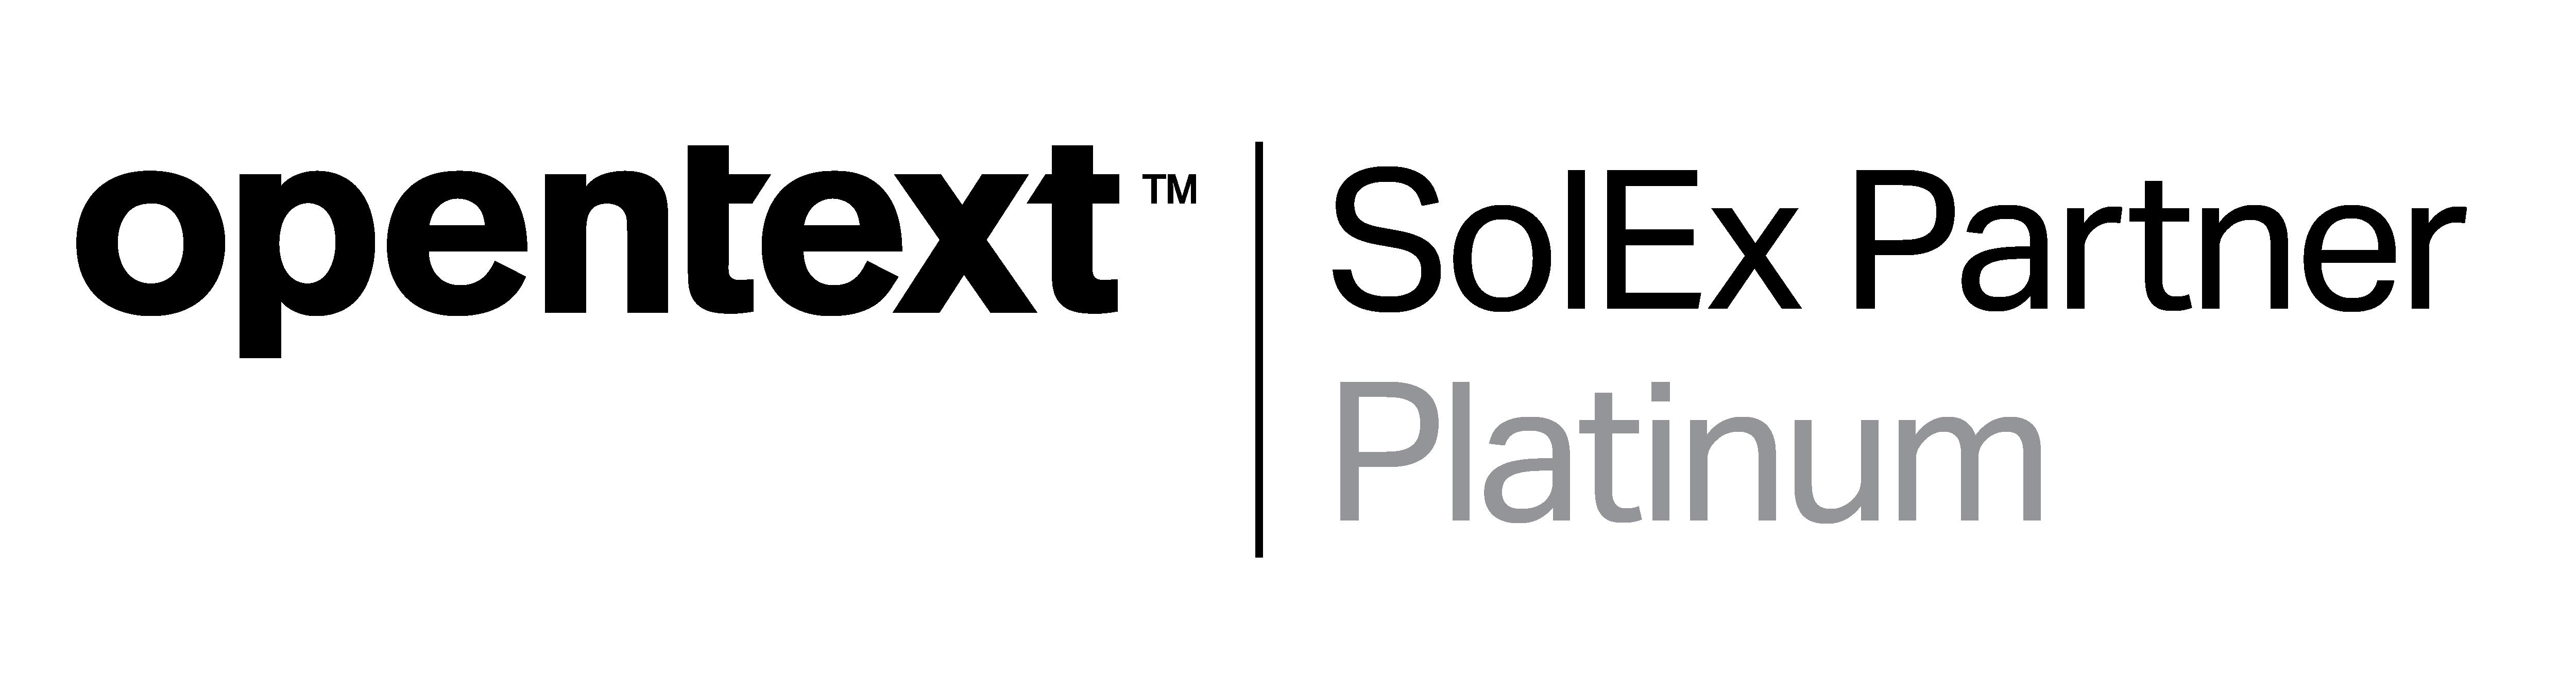 OT SolEx Partner Platinum Wordmark